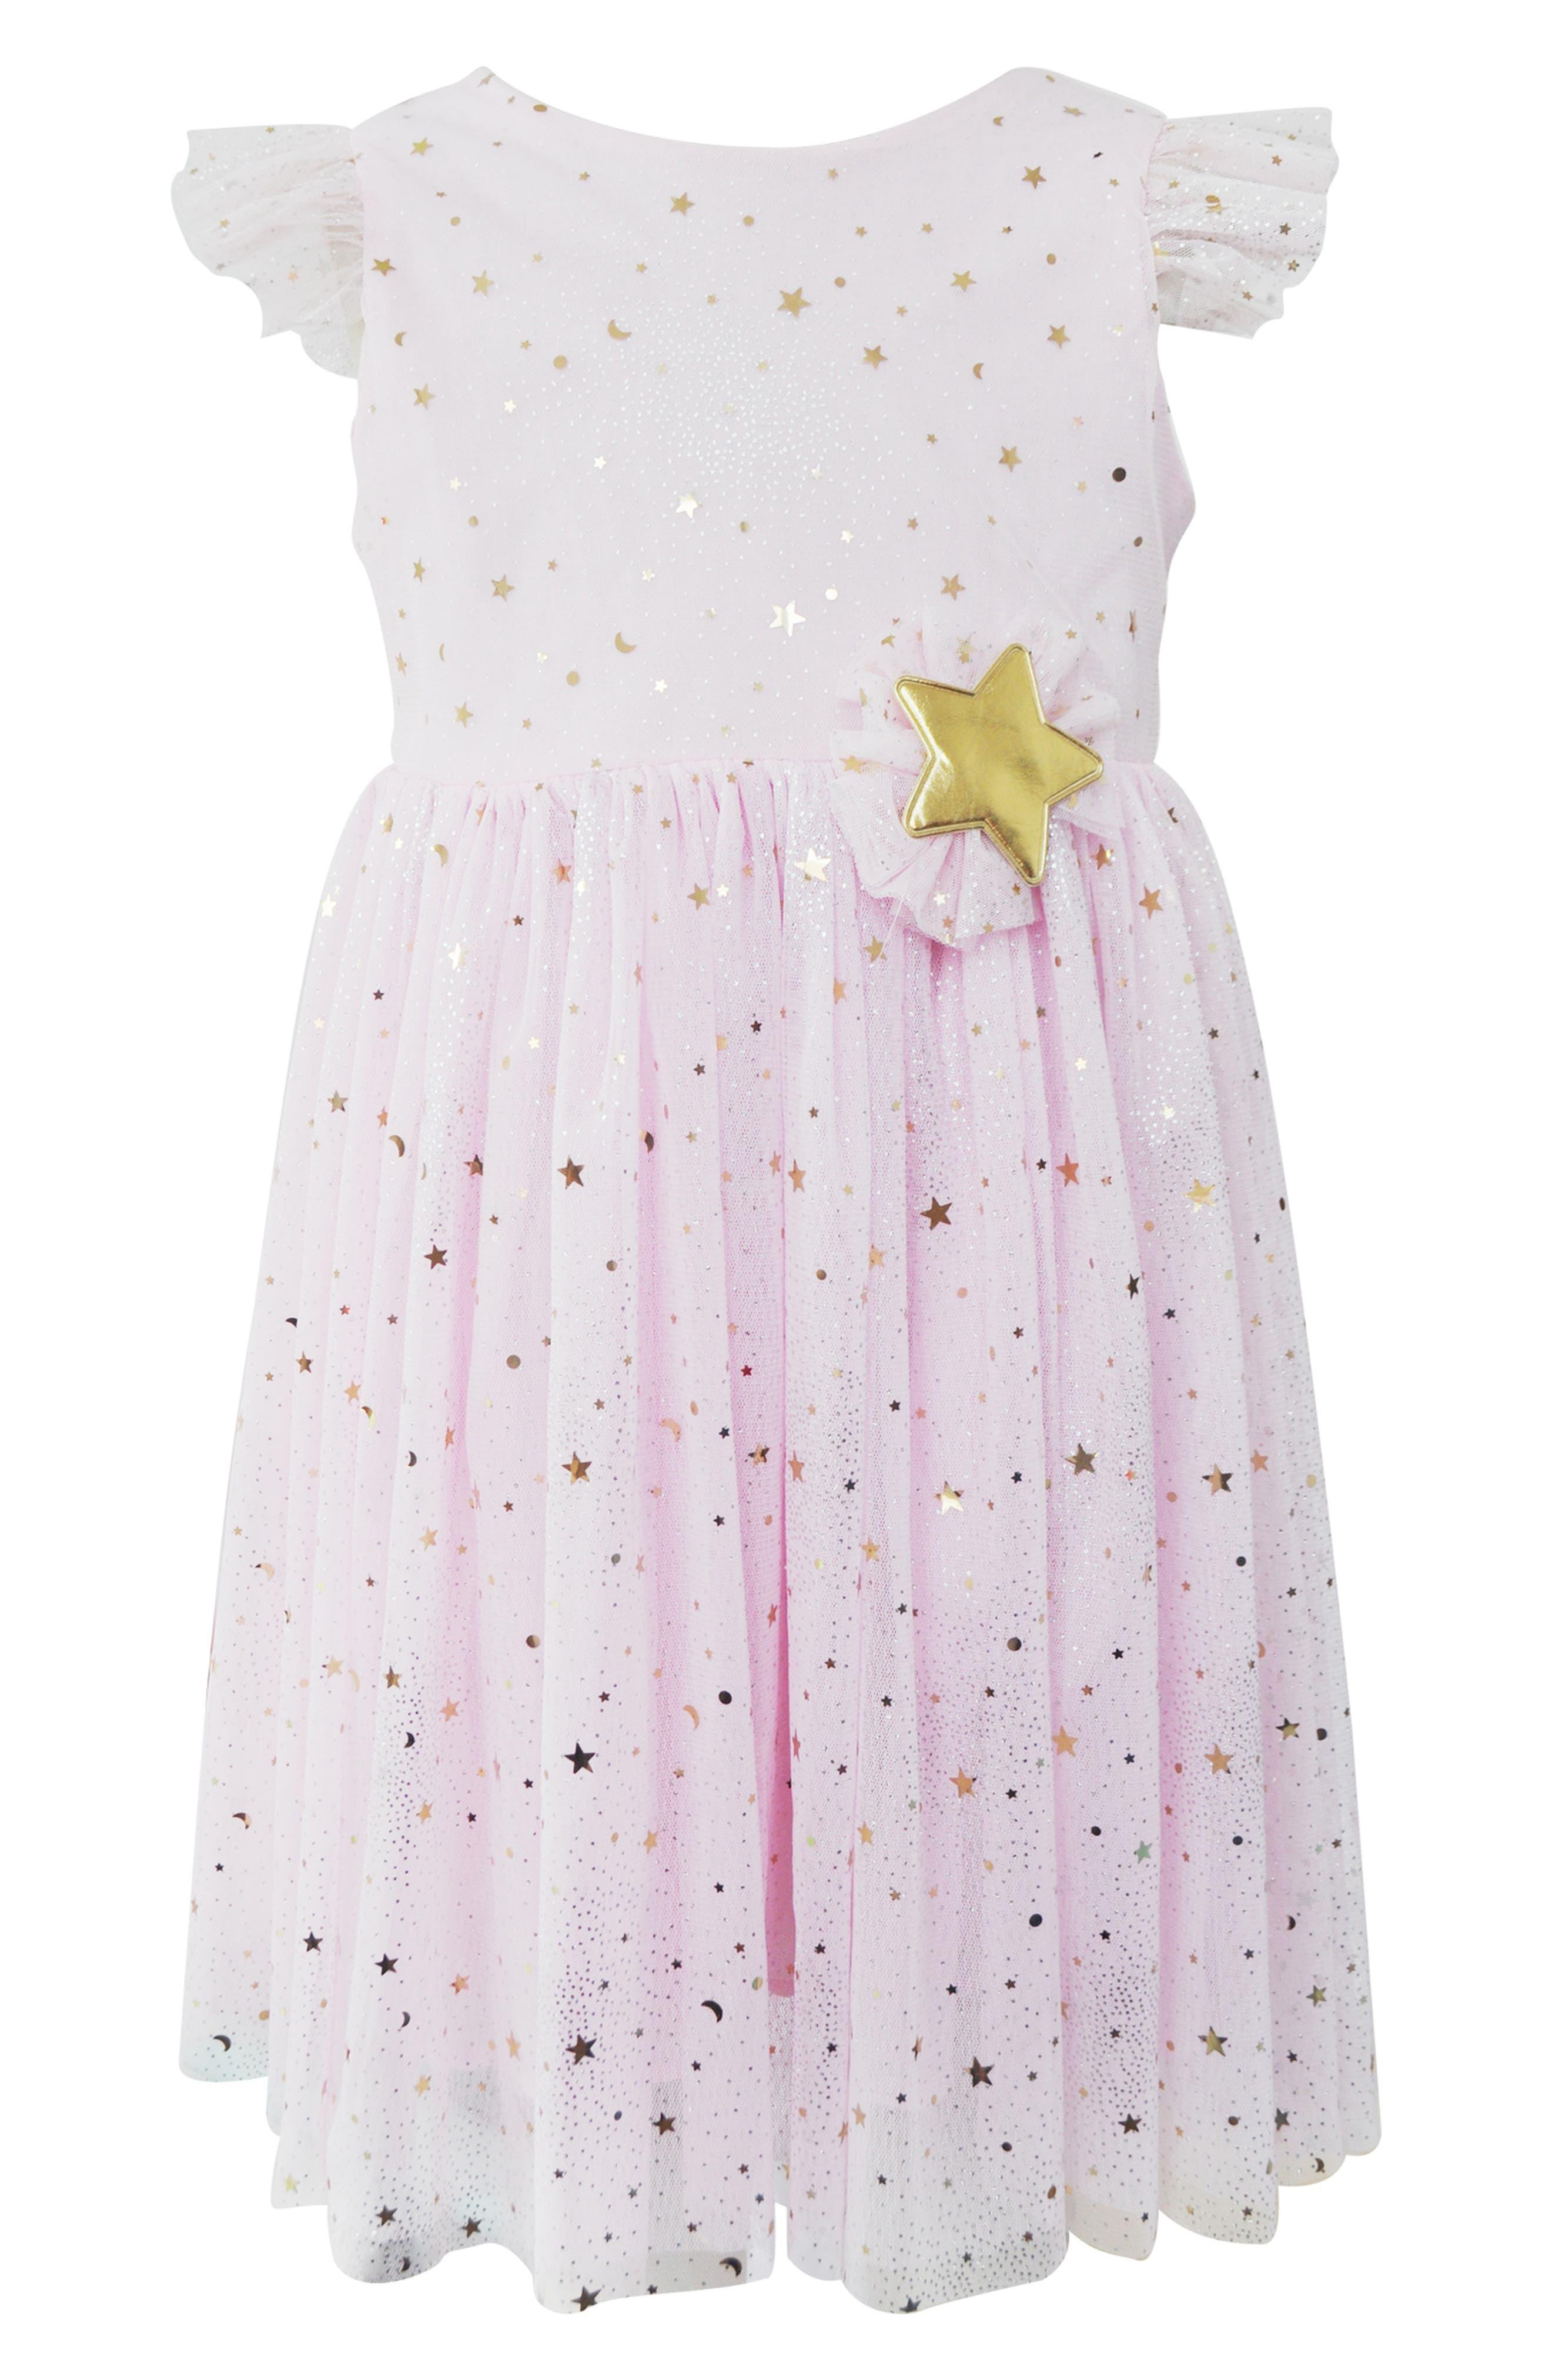 Image of Popatu Gold Foil Star Dress